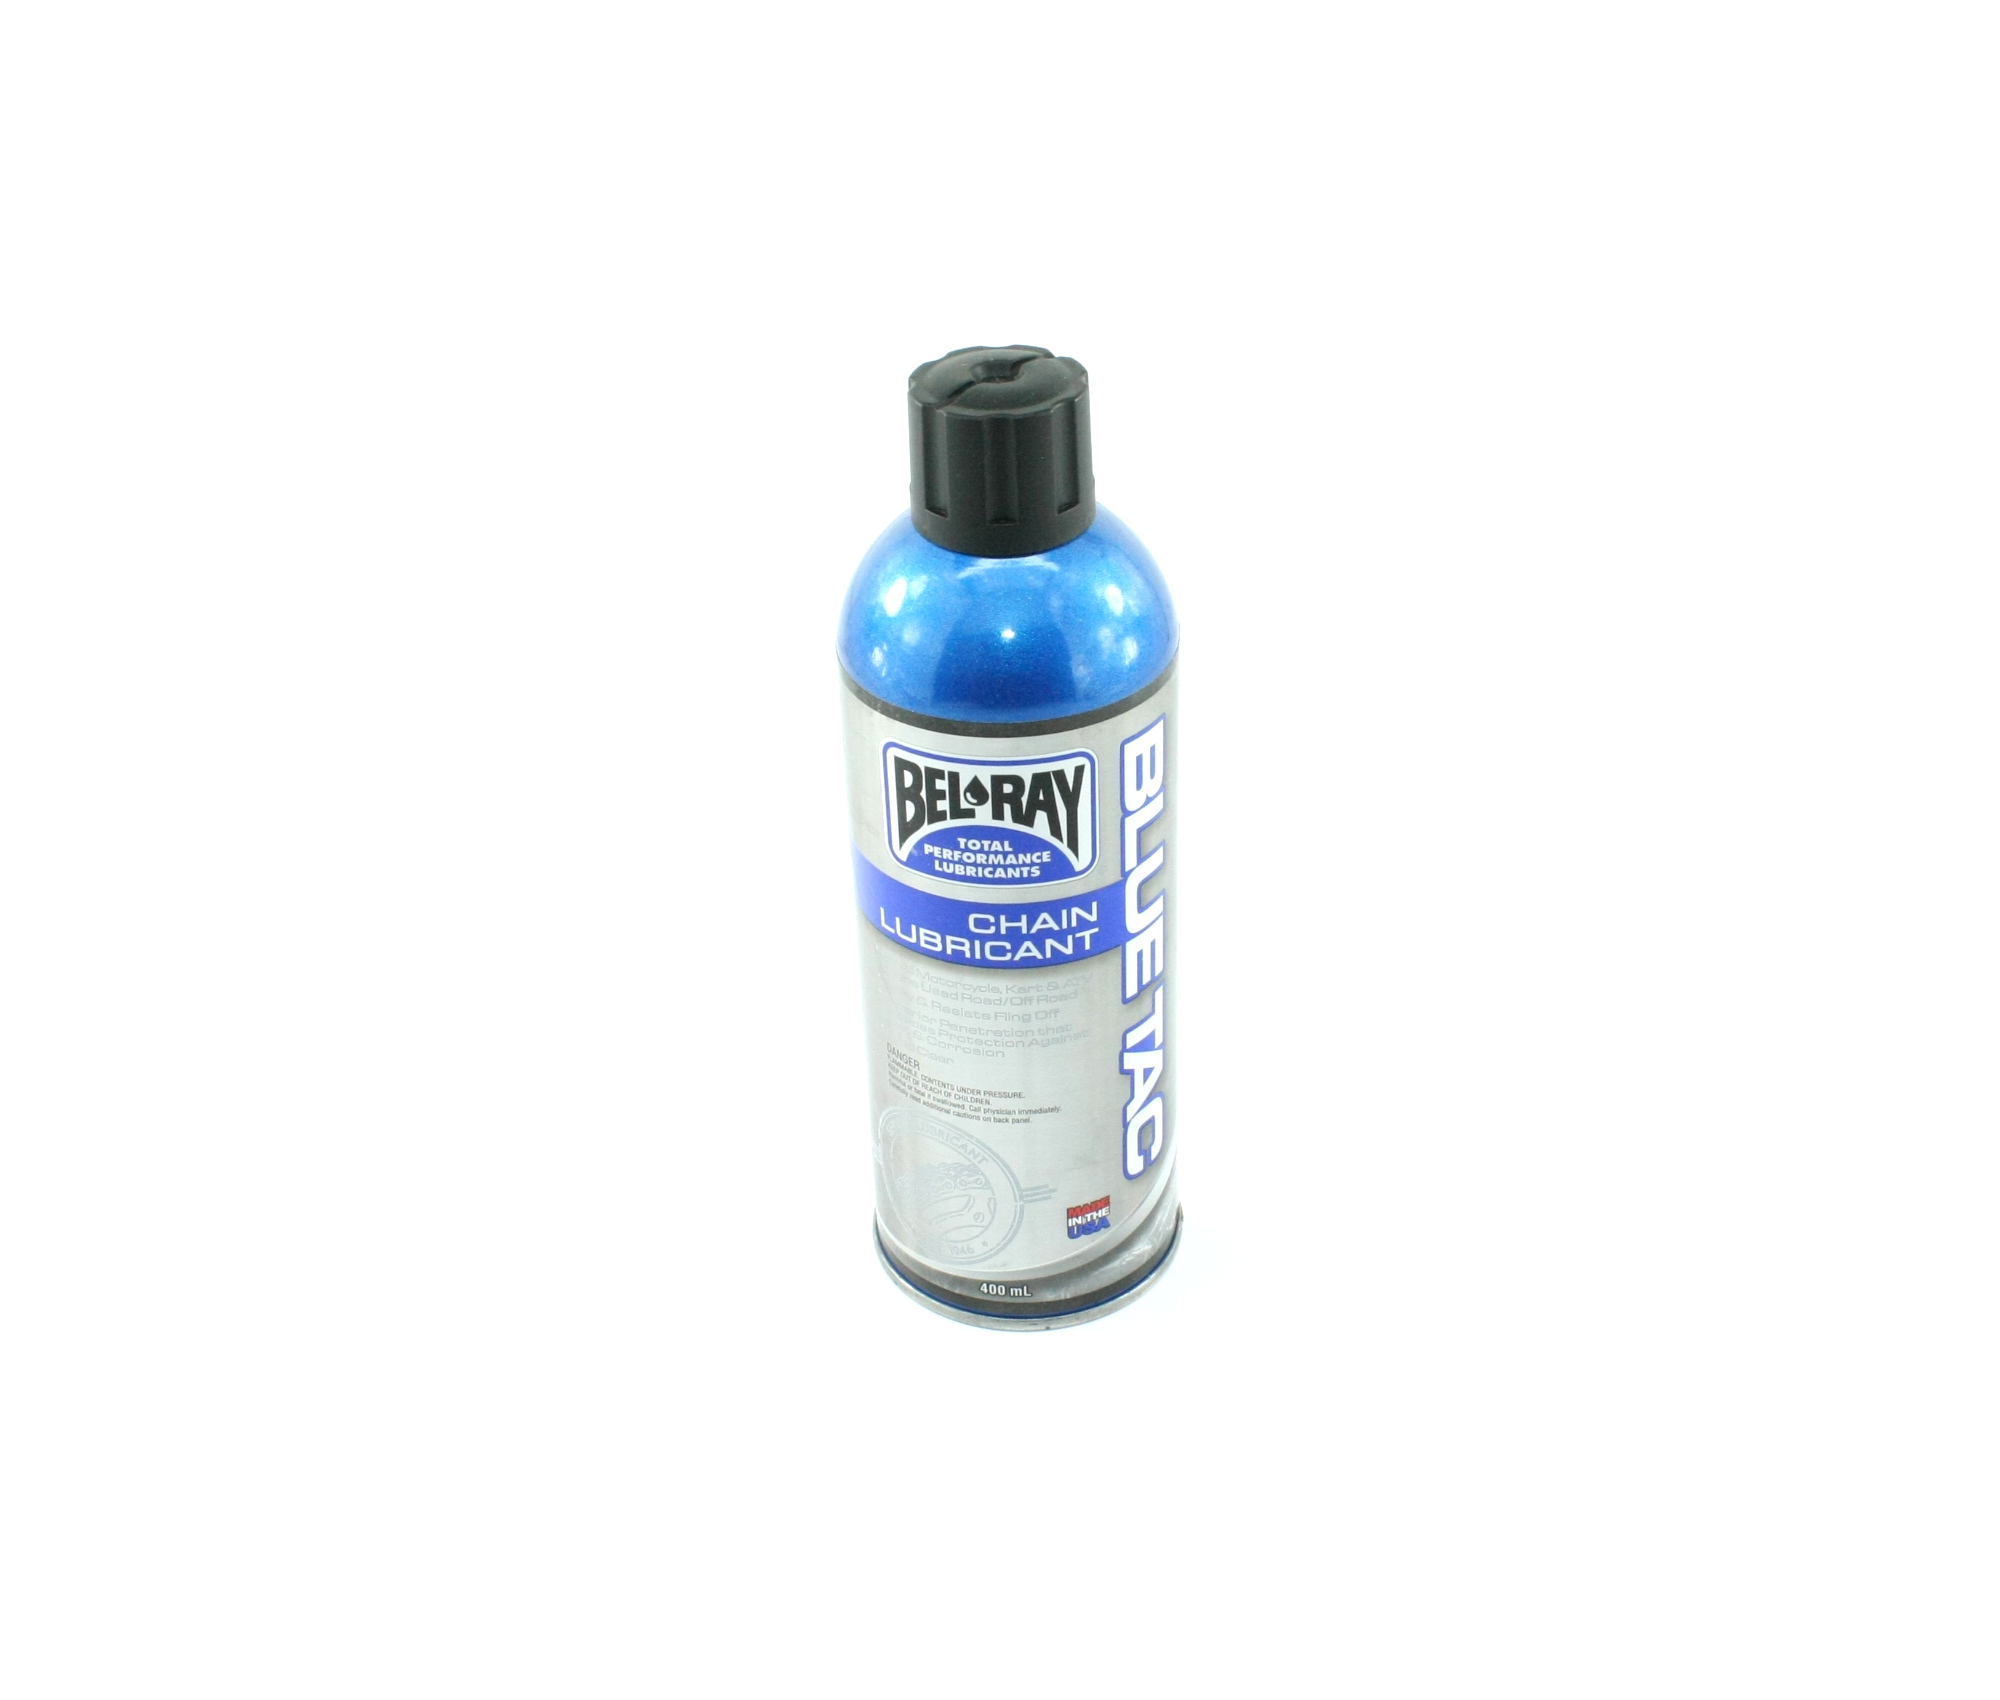 BEL-RAY SMAR DO ŁAŃCUCHA BLUE TAC 400ml SPRAY